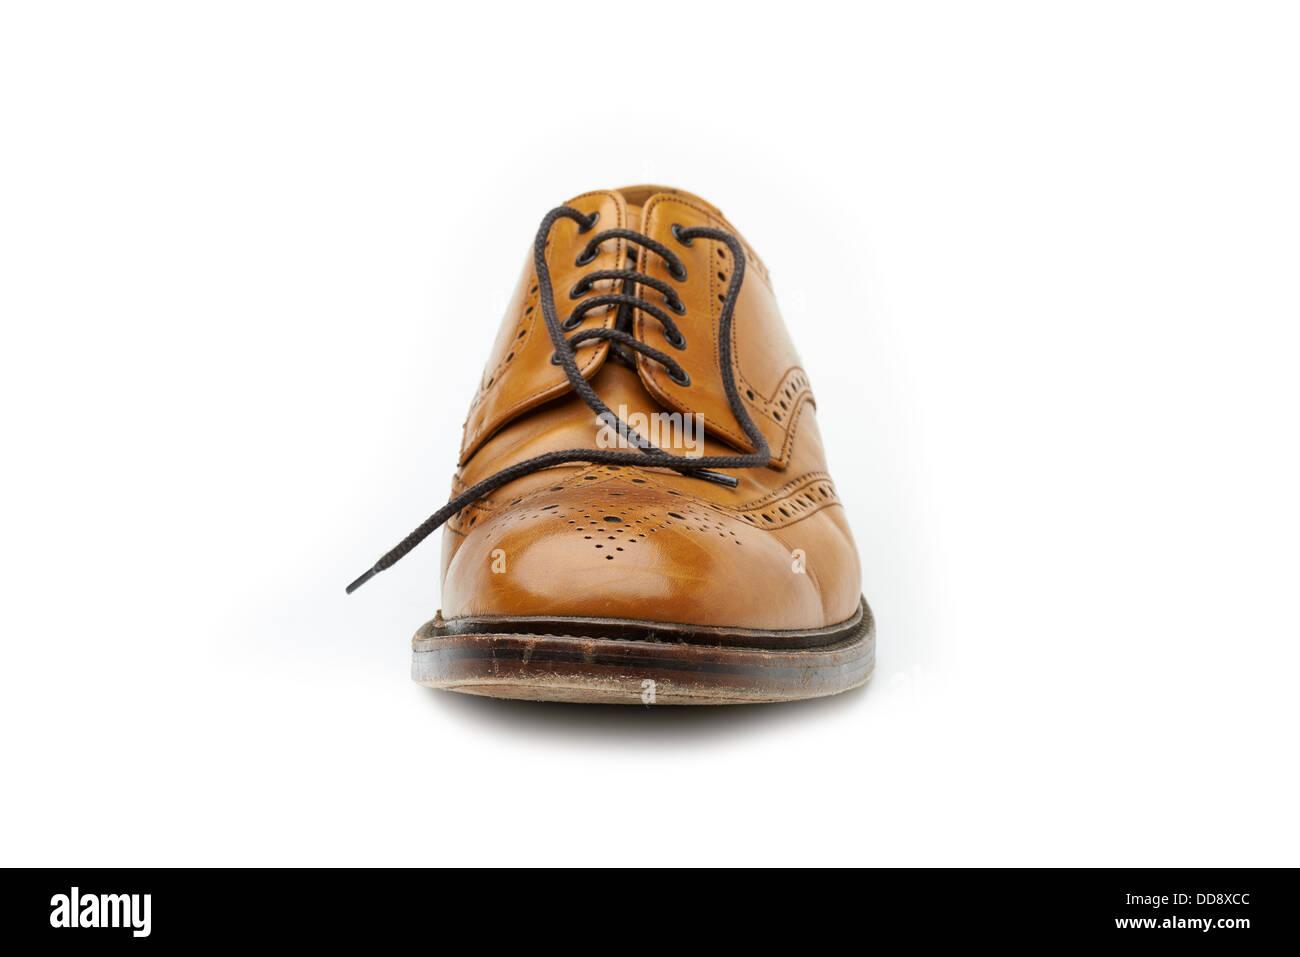 Cuir Classique Brogues Anglais En Tan Loake Chaussures knwOP0